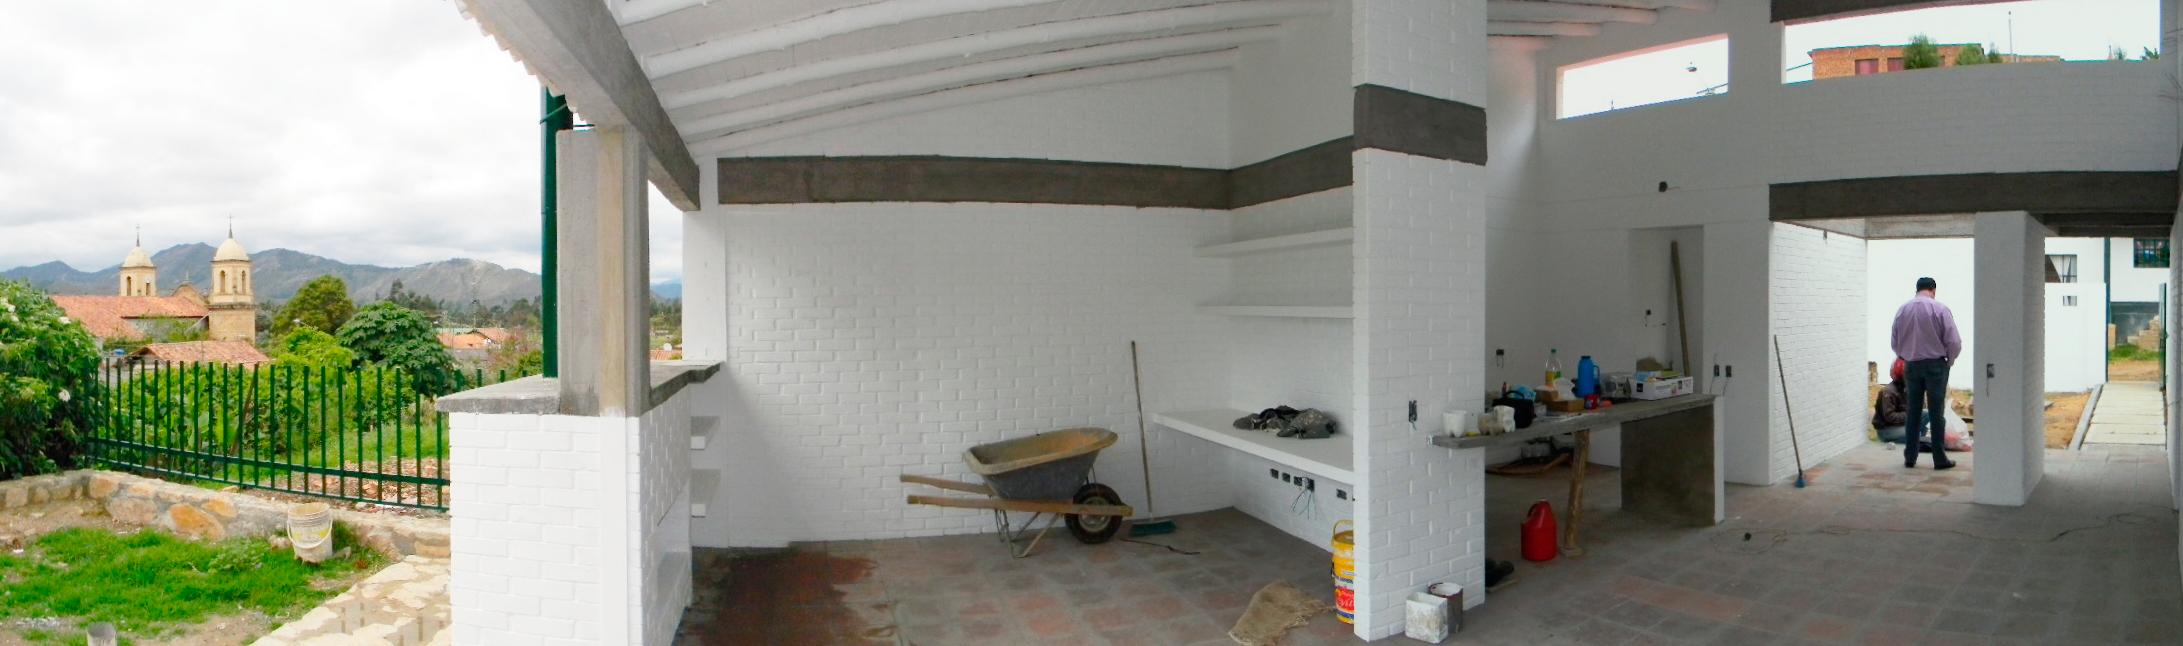 Panorama-36.jpg